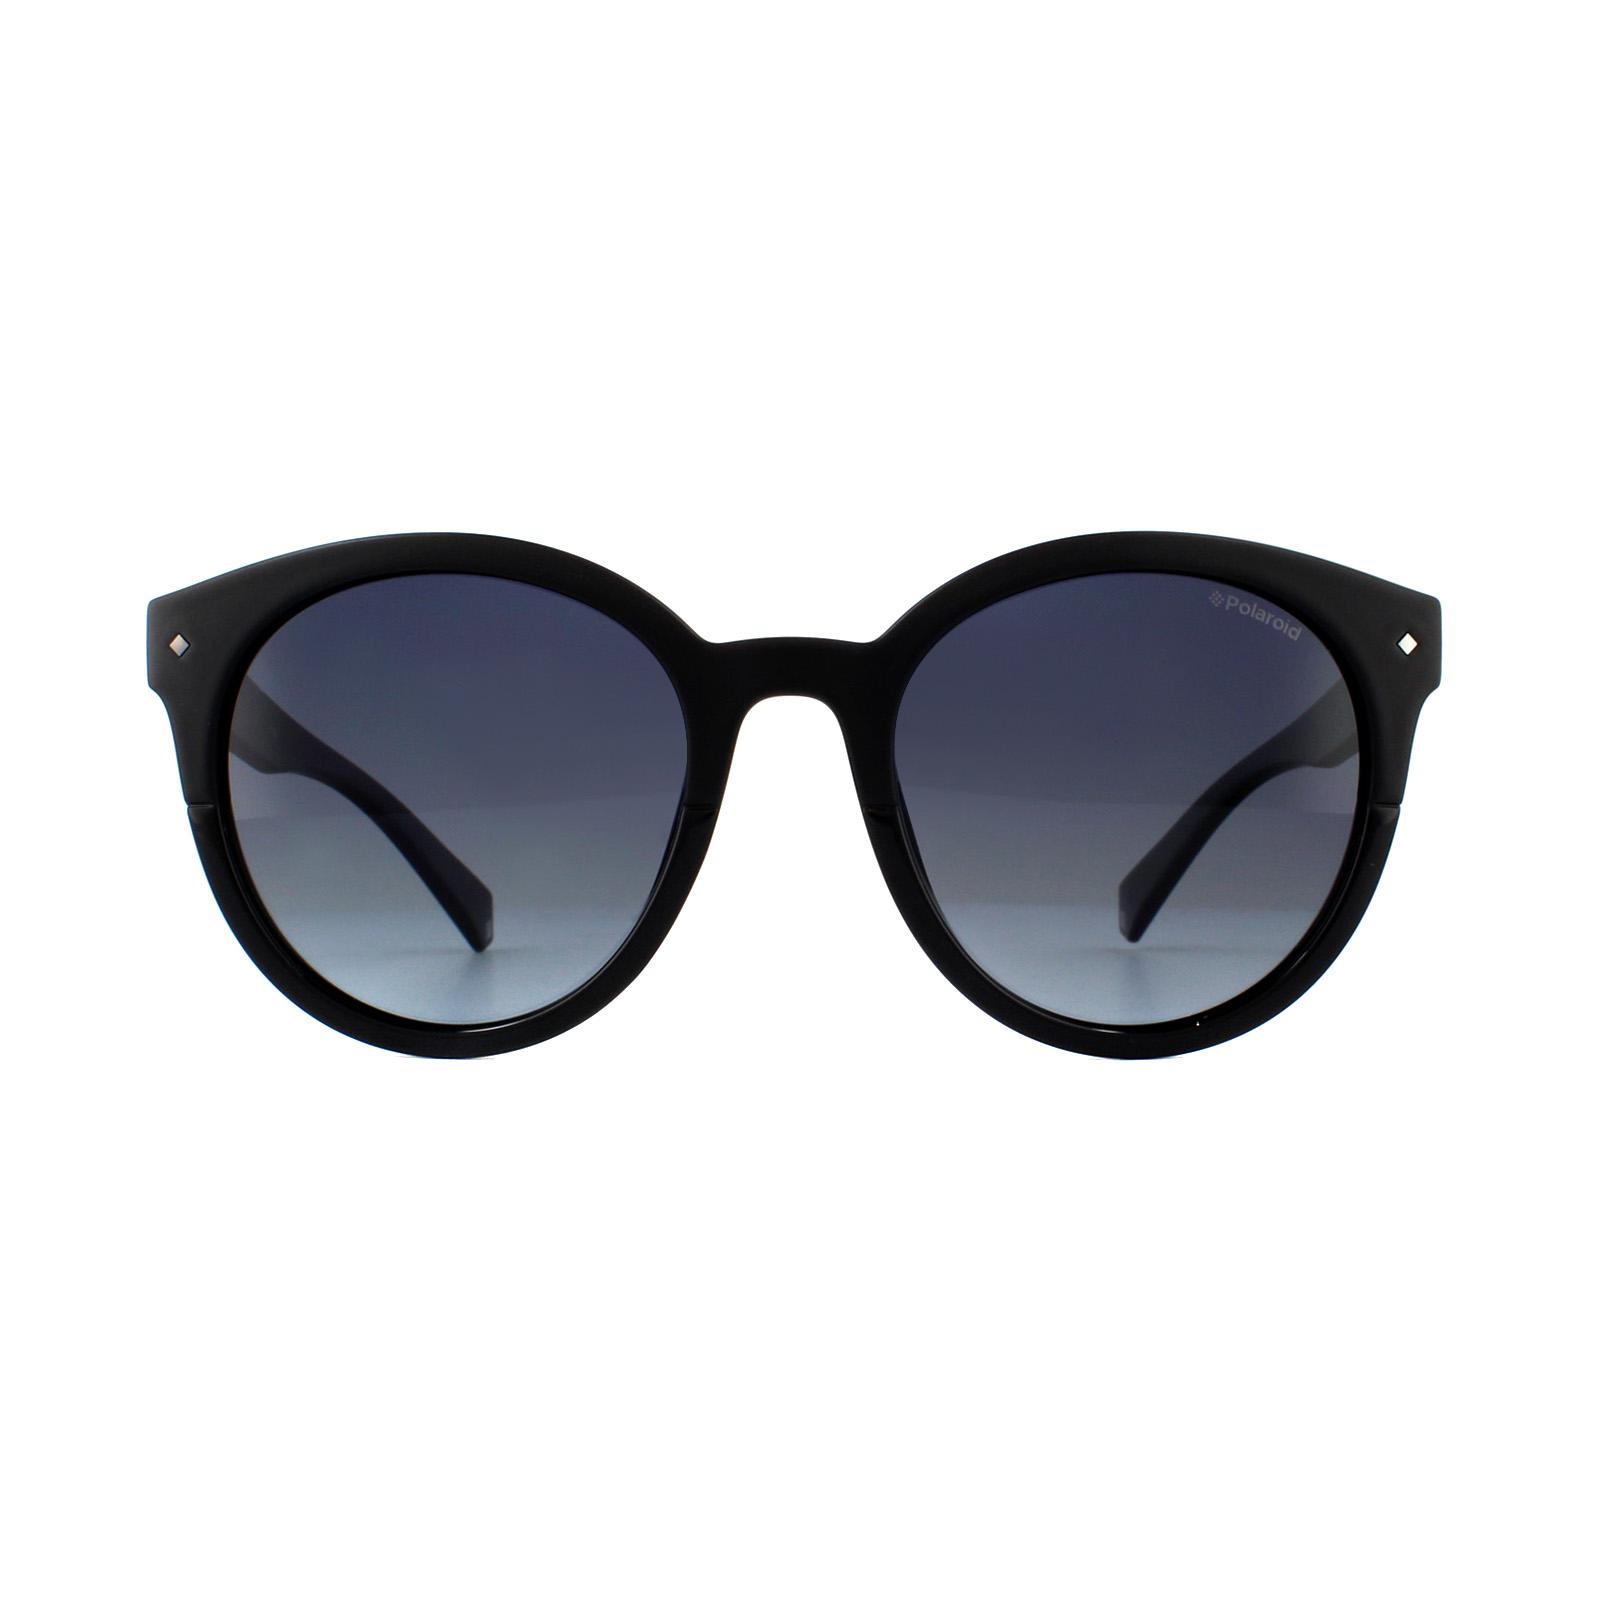 035c6bdd9249b Sentinel Polaroid Sunglasses PLD 6043 S 807 WJ Black Grey Gradient Polarized